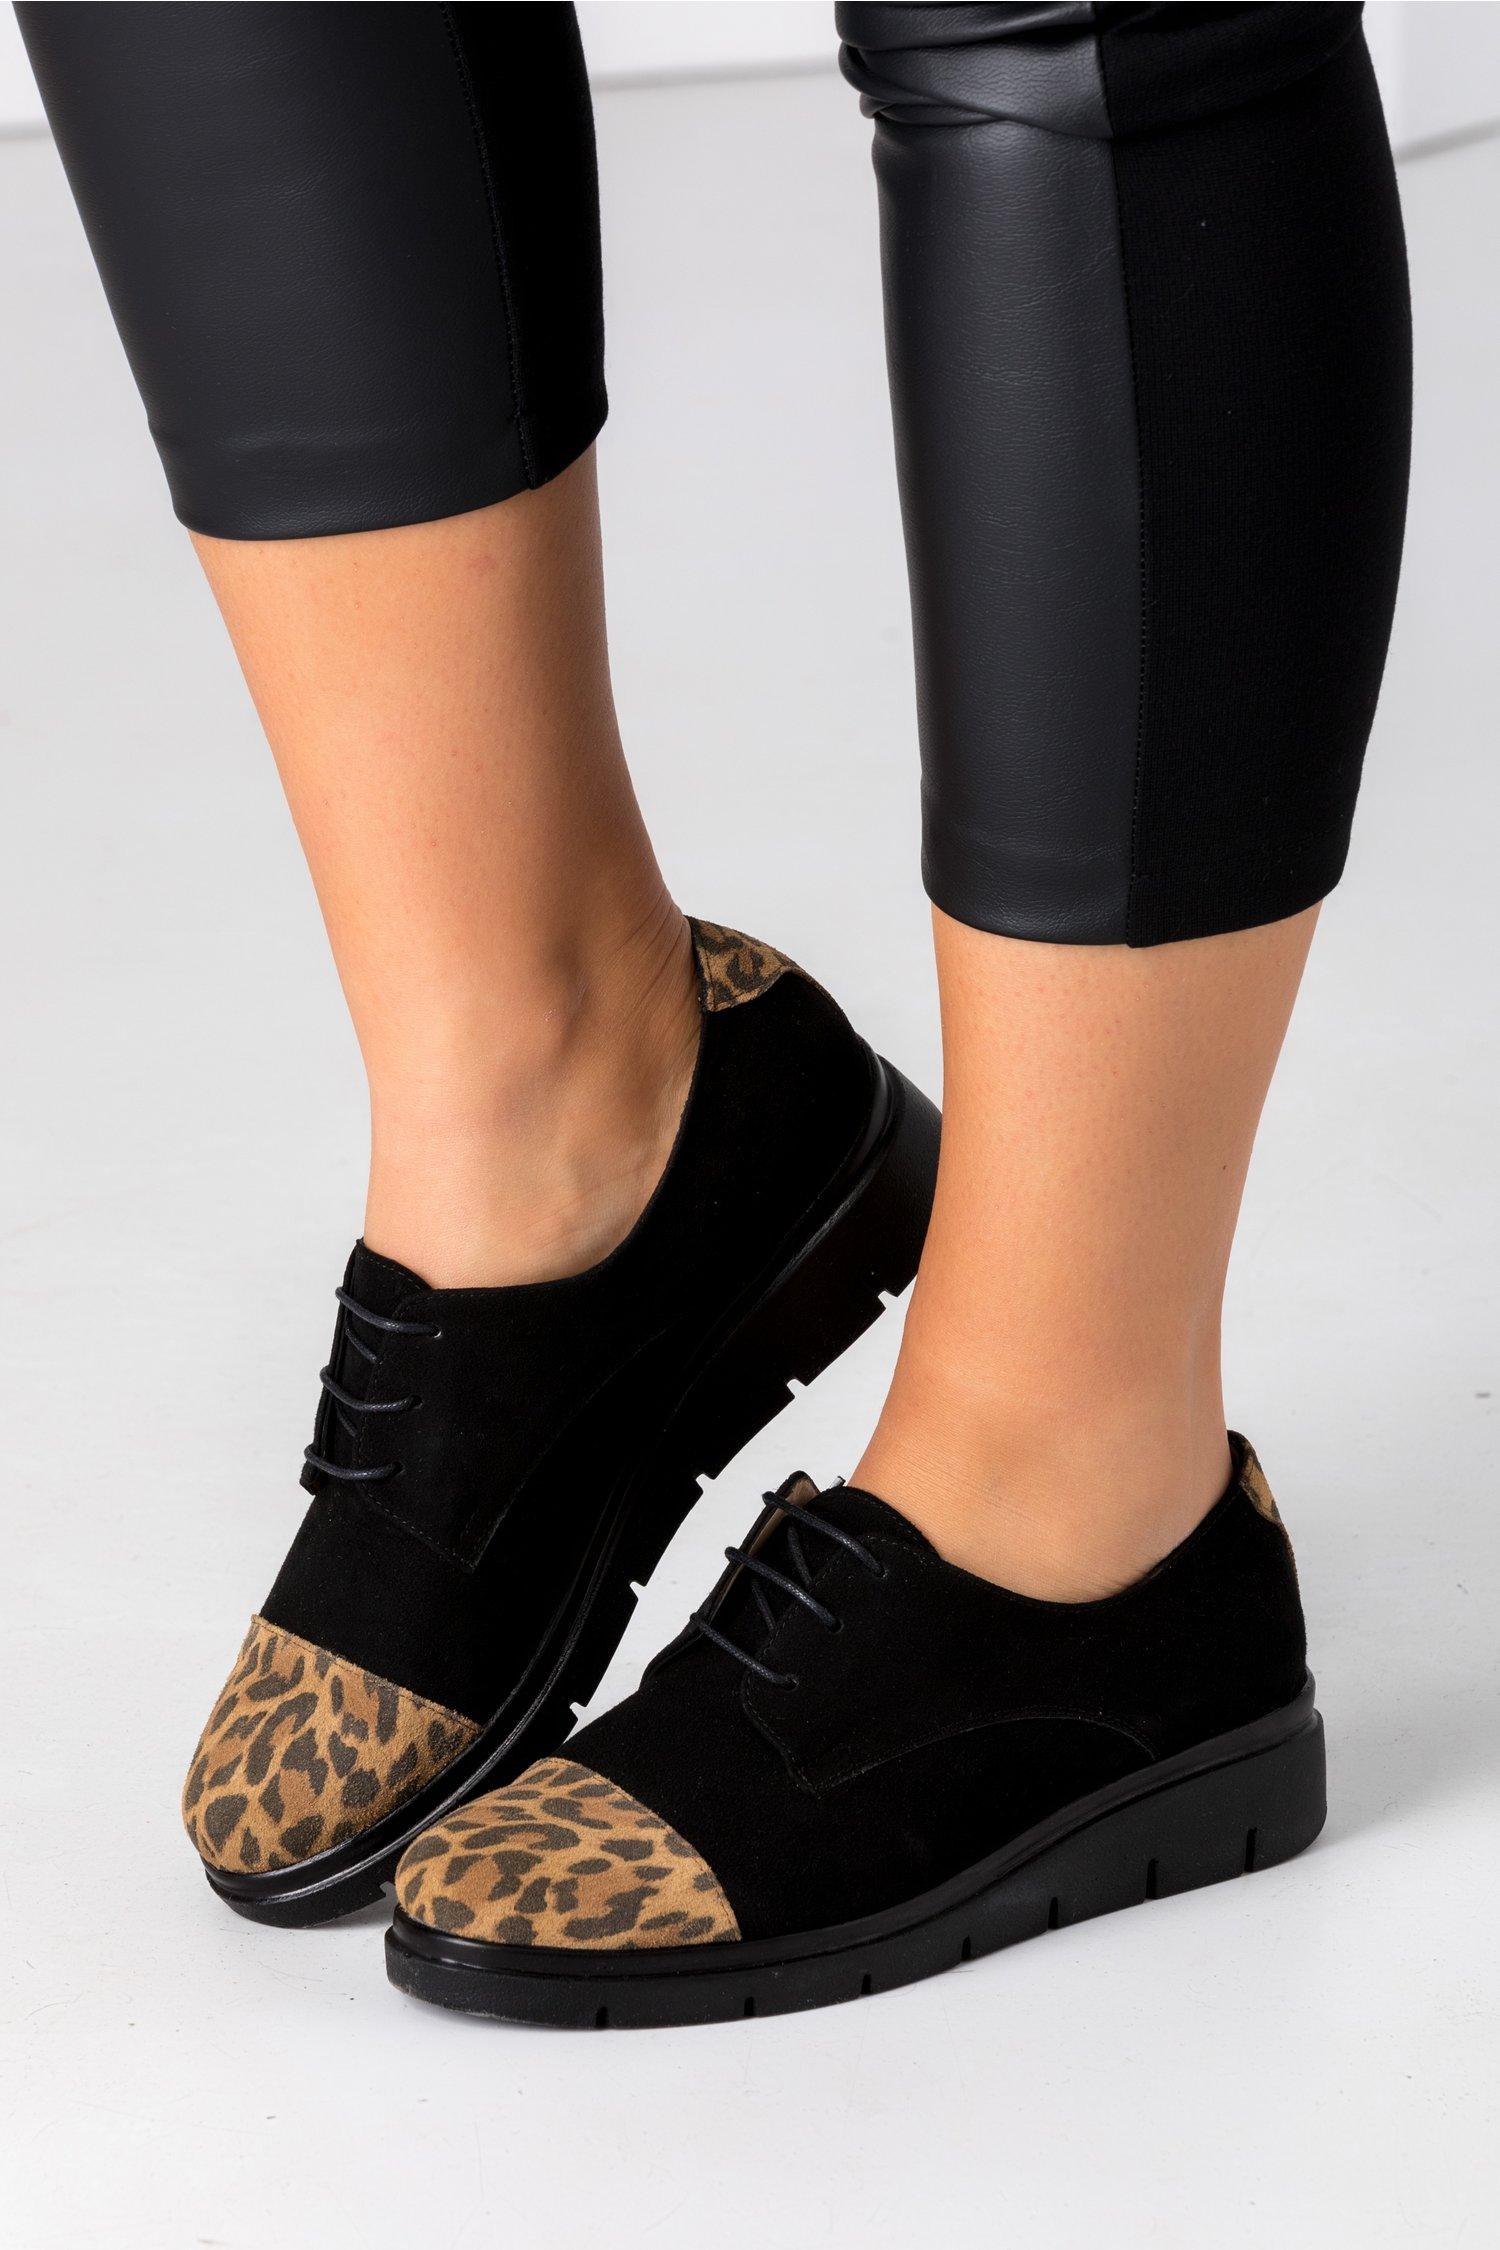 Pantofi Oxford negri cu animal print